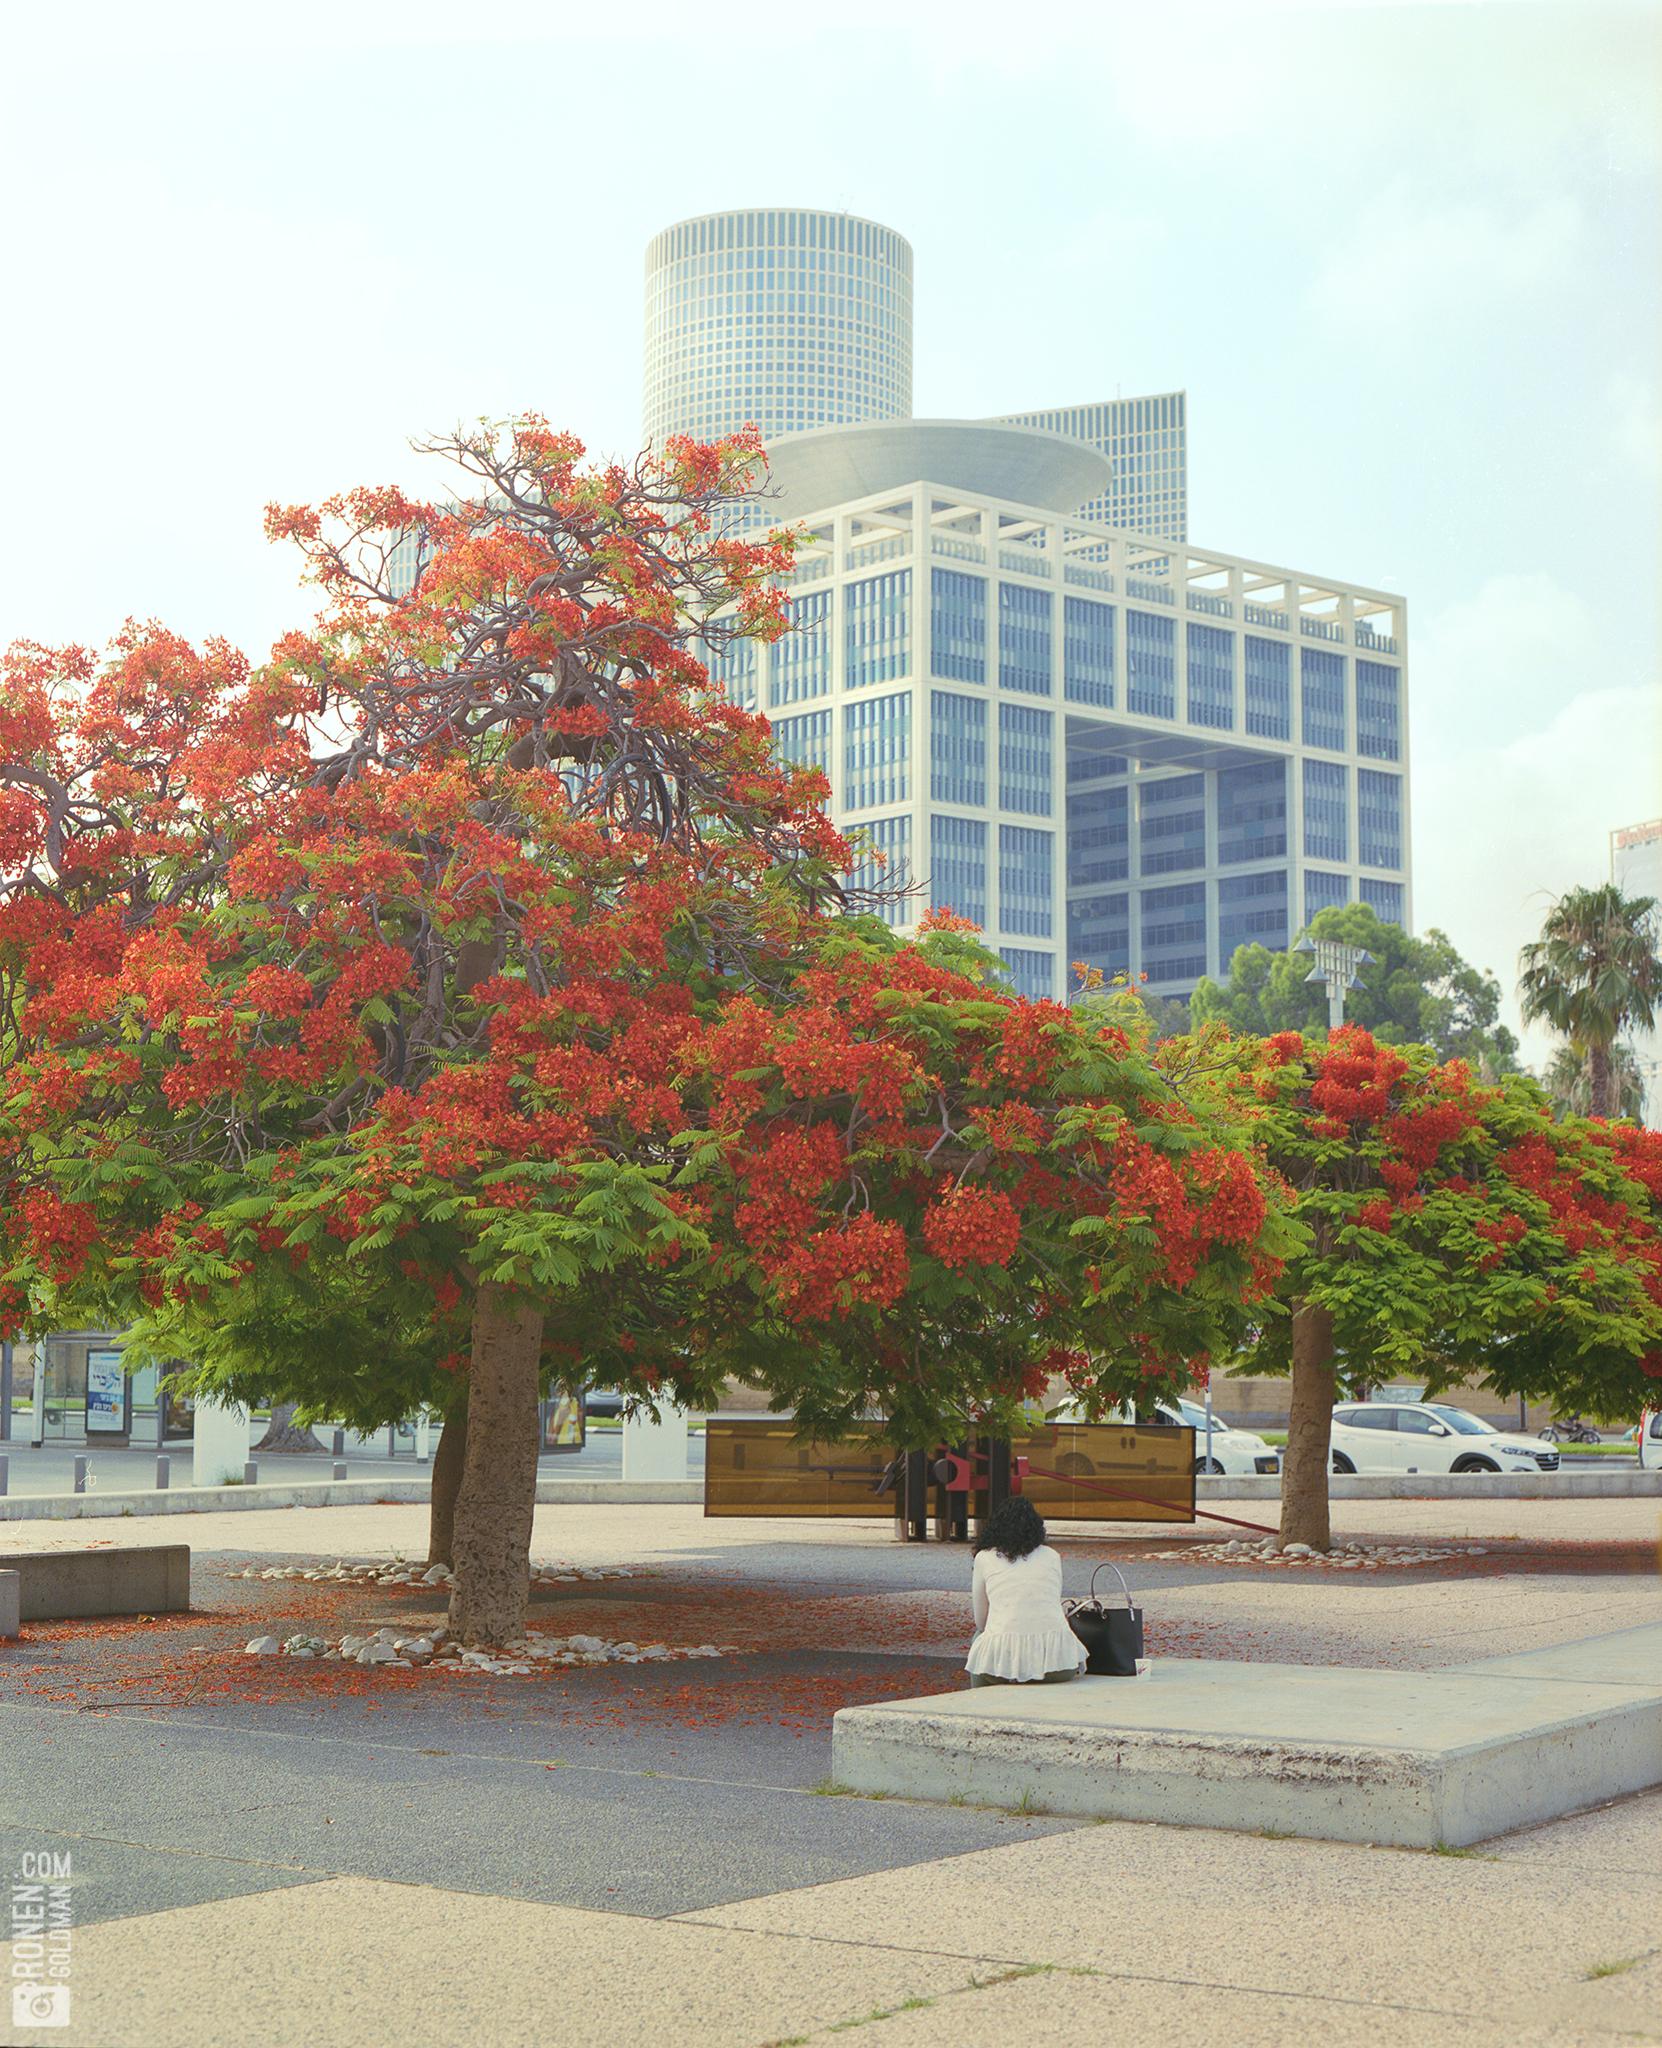 tokyo Tel Aviv.jpg